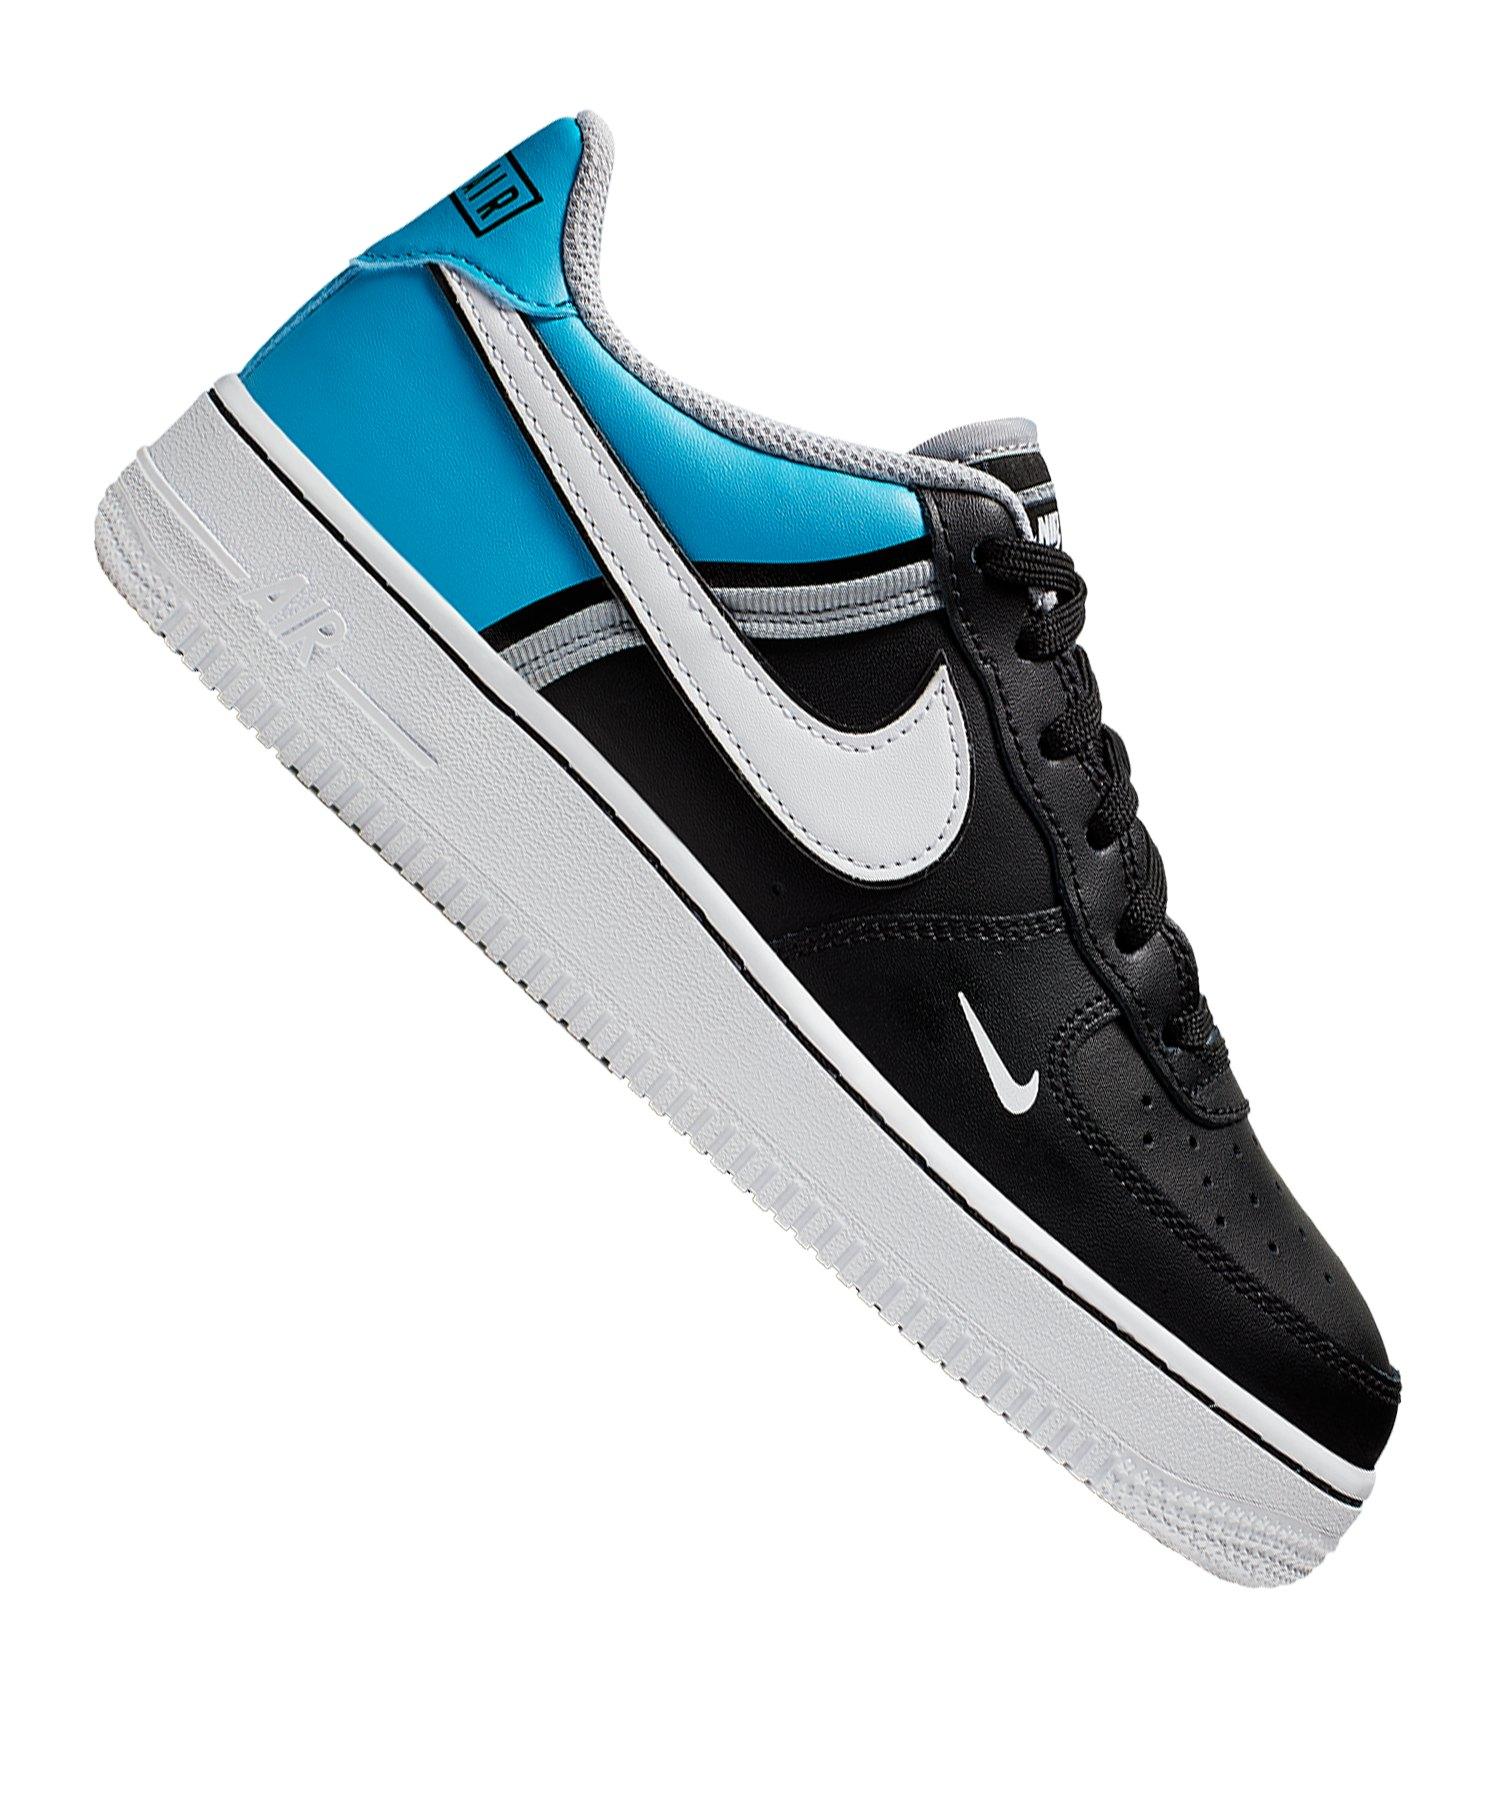 Nike Nike Air Force 1 High LV8 GS Kinderschuhe oliv | Damen Hohe Sneaker · Eibe Kaufen